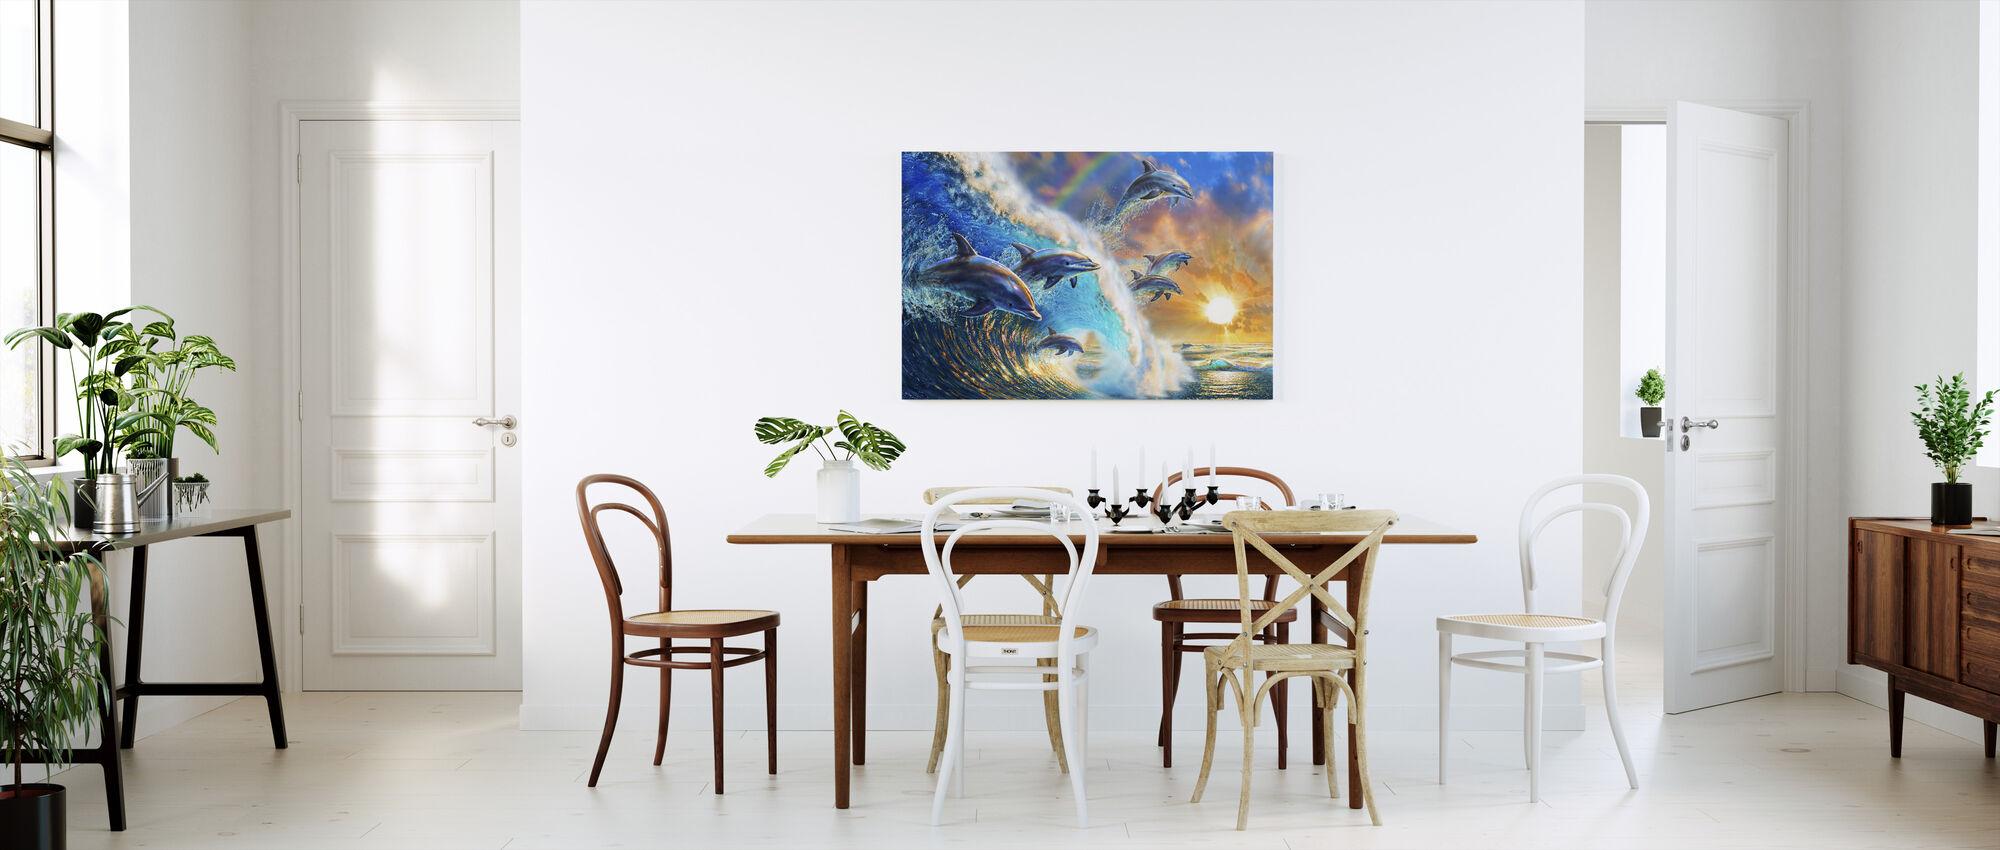 Dolphin Wave - Canvas print - Kitchen